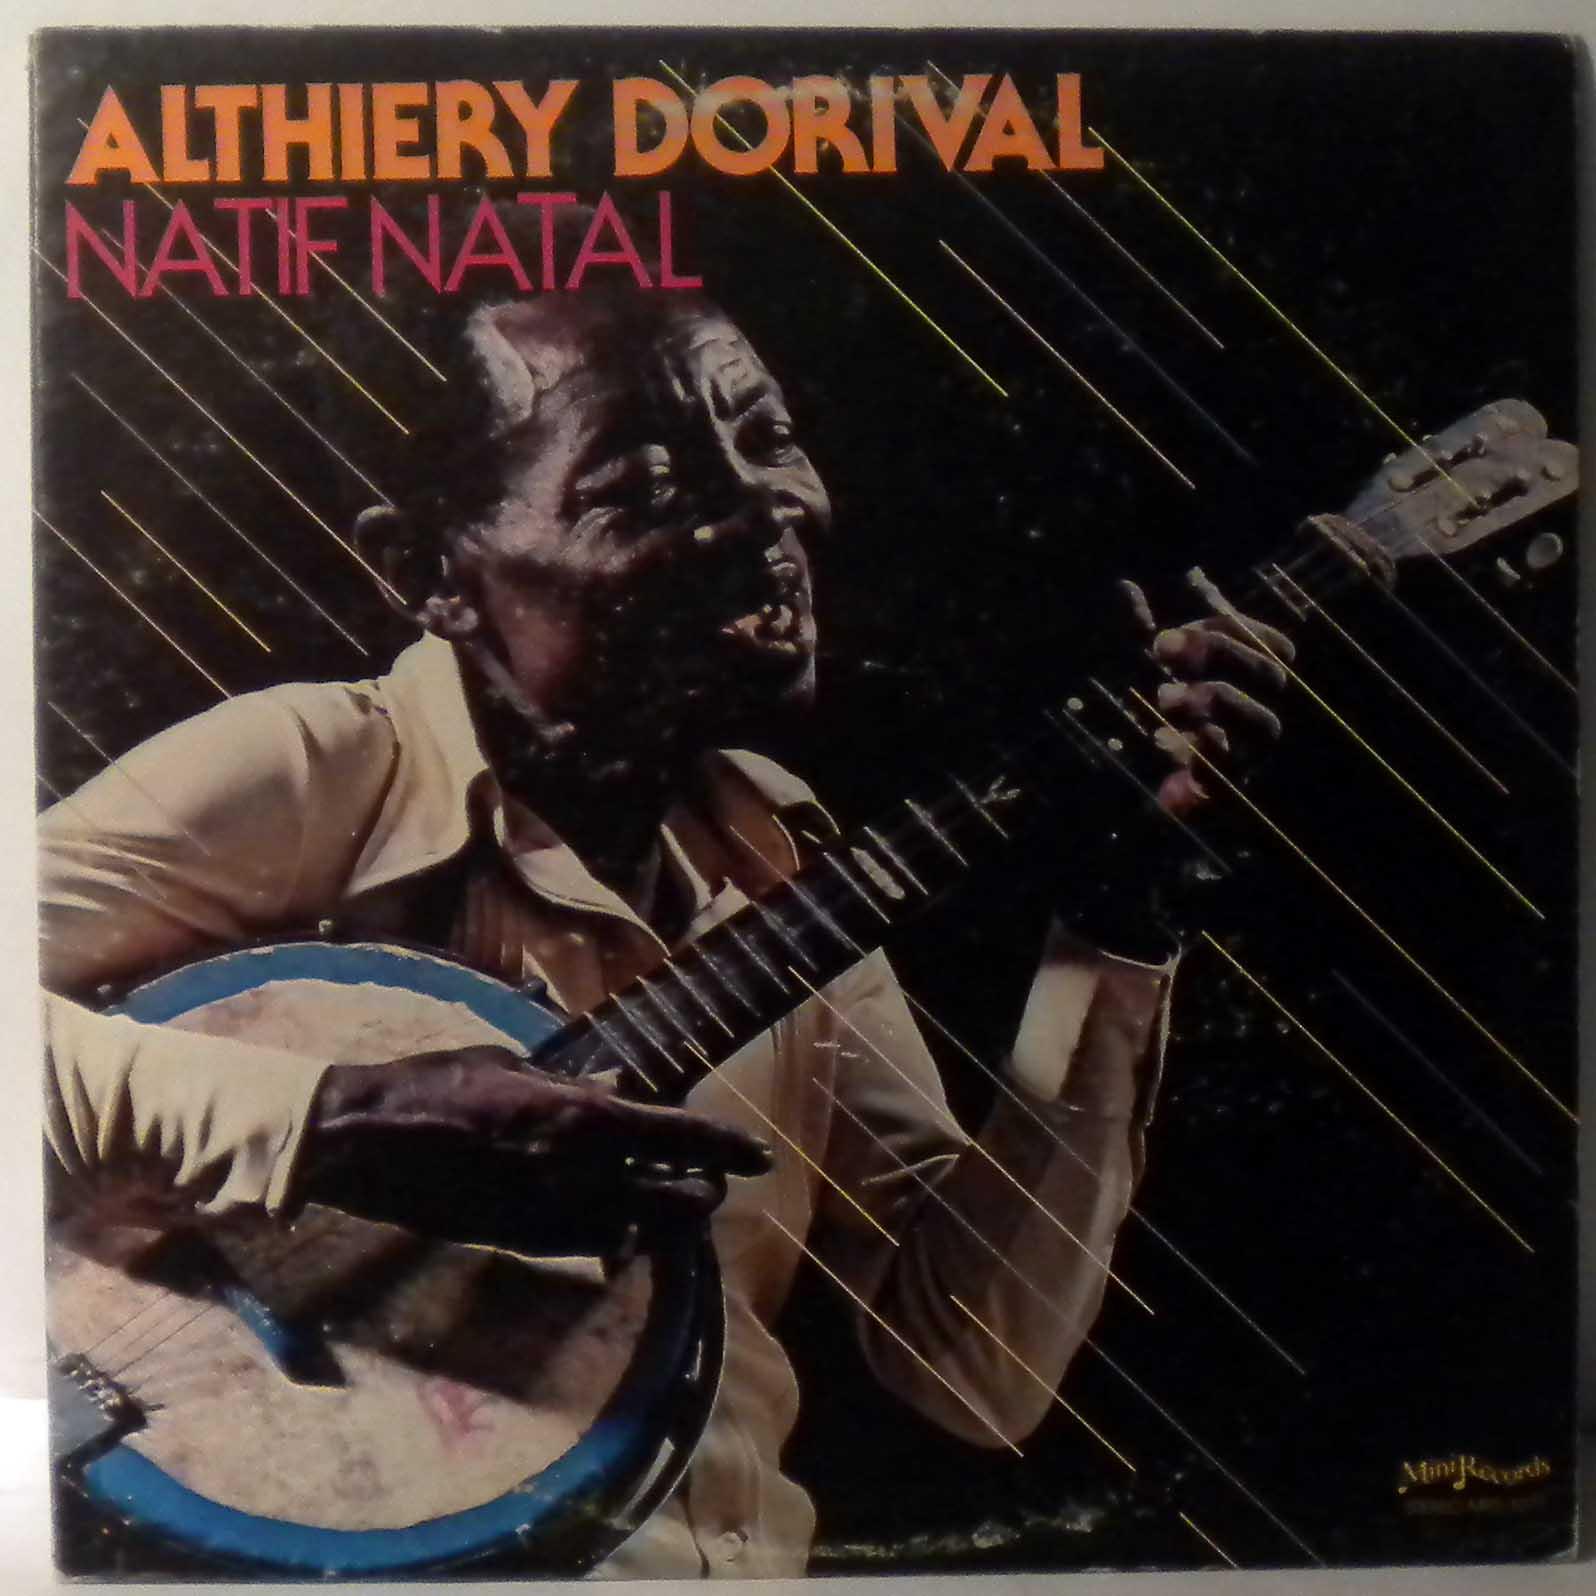 ALTHIERY DORIVAL - Natif natal - LP